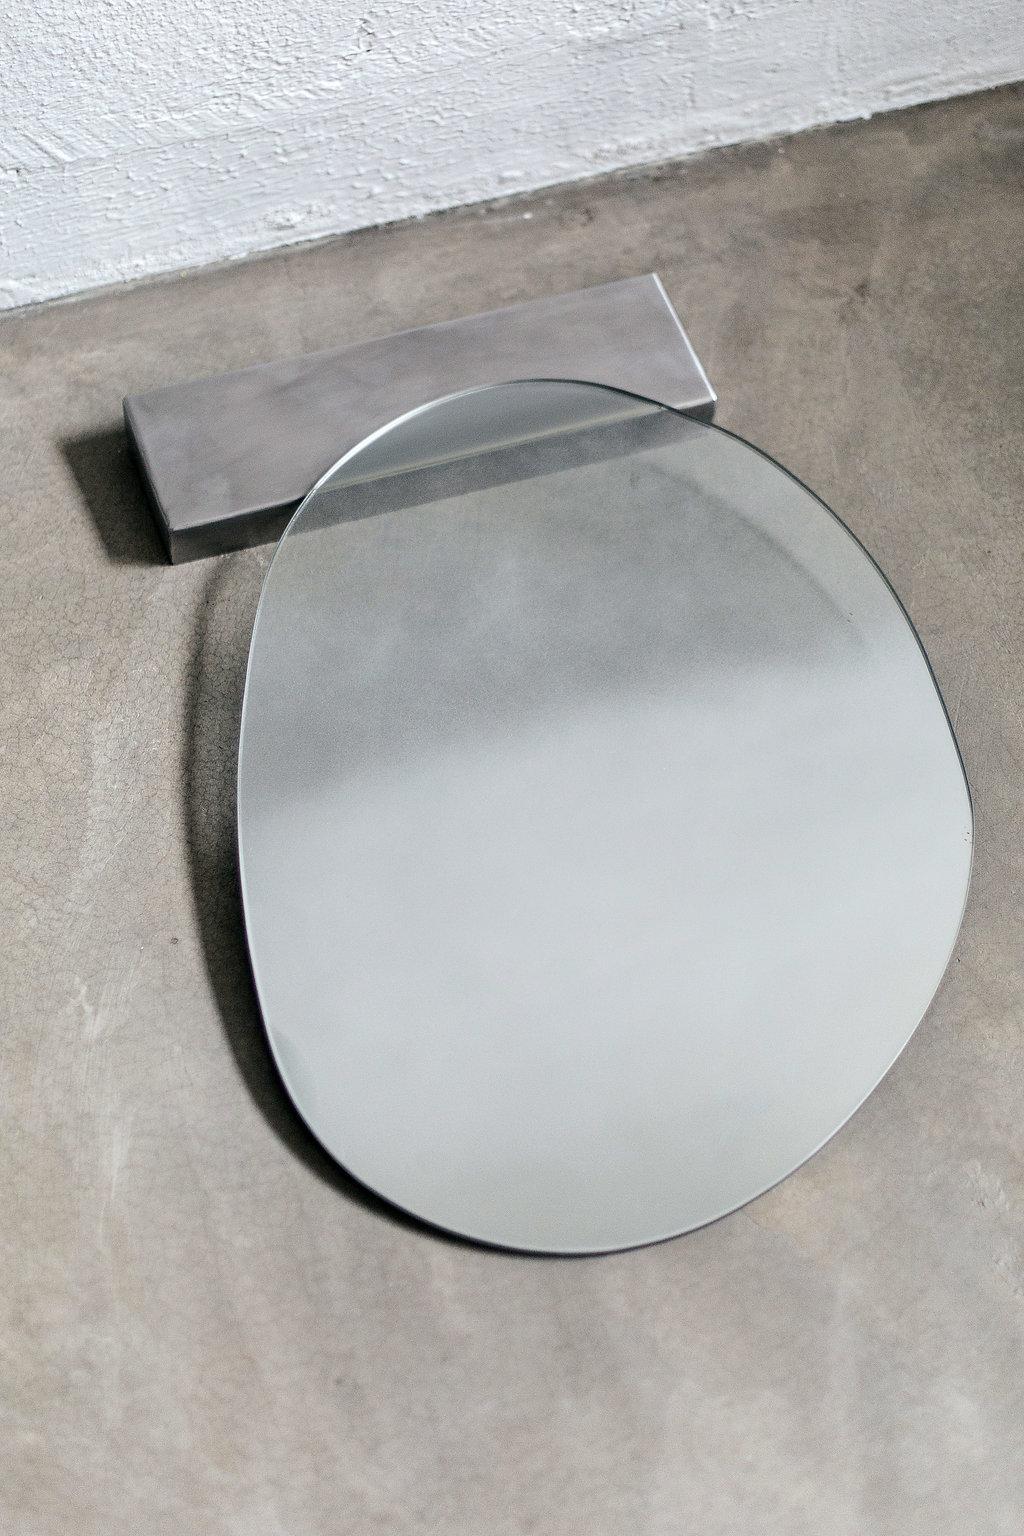 180123_luizaflorenzano-glass11-boobam_057